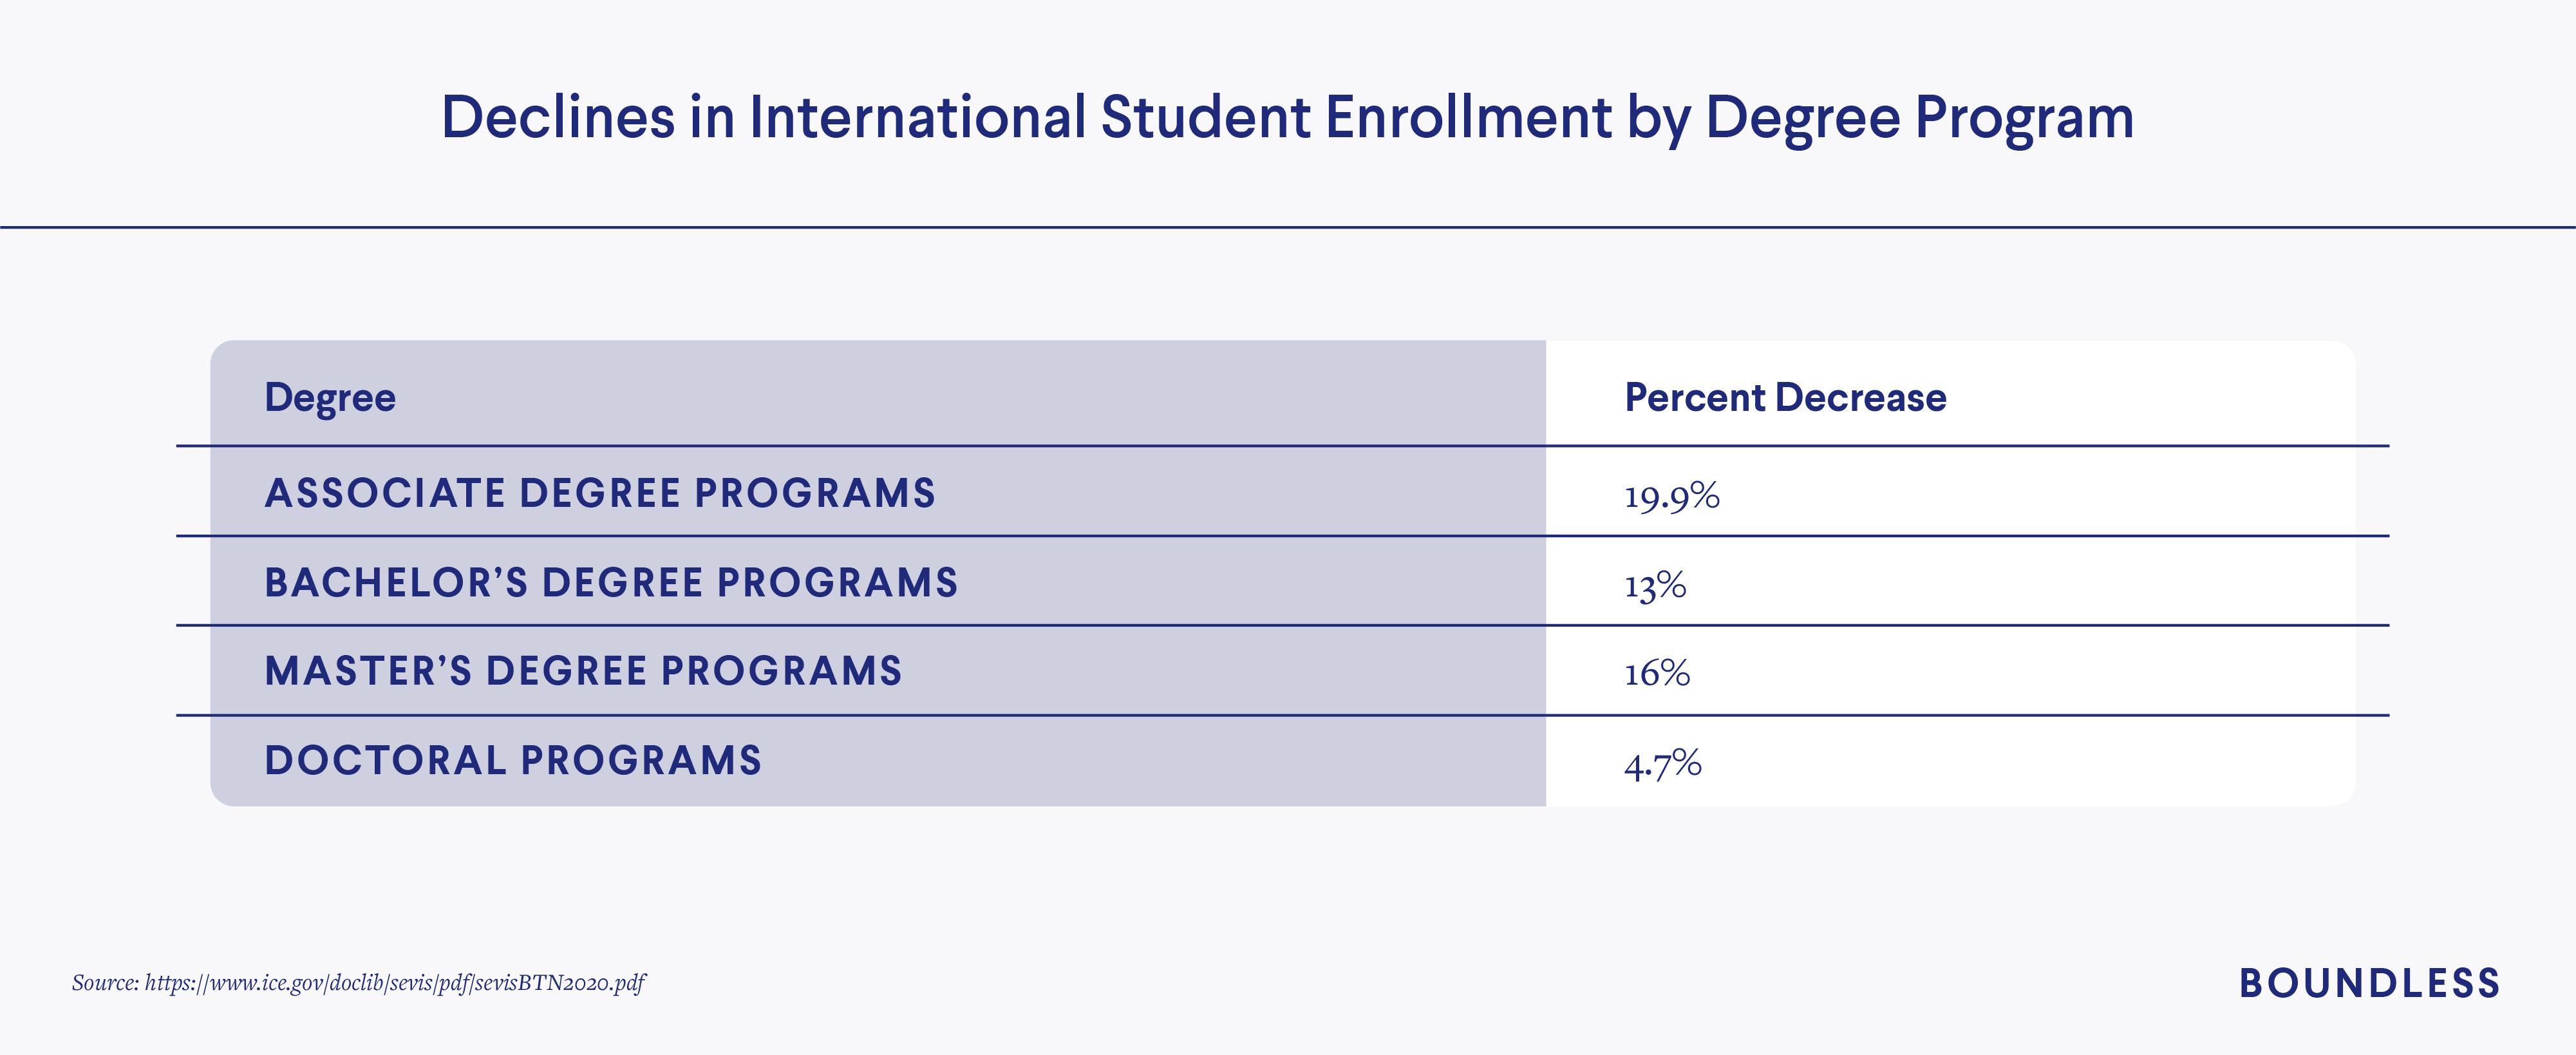 Declines in international student enrollments by degree program